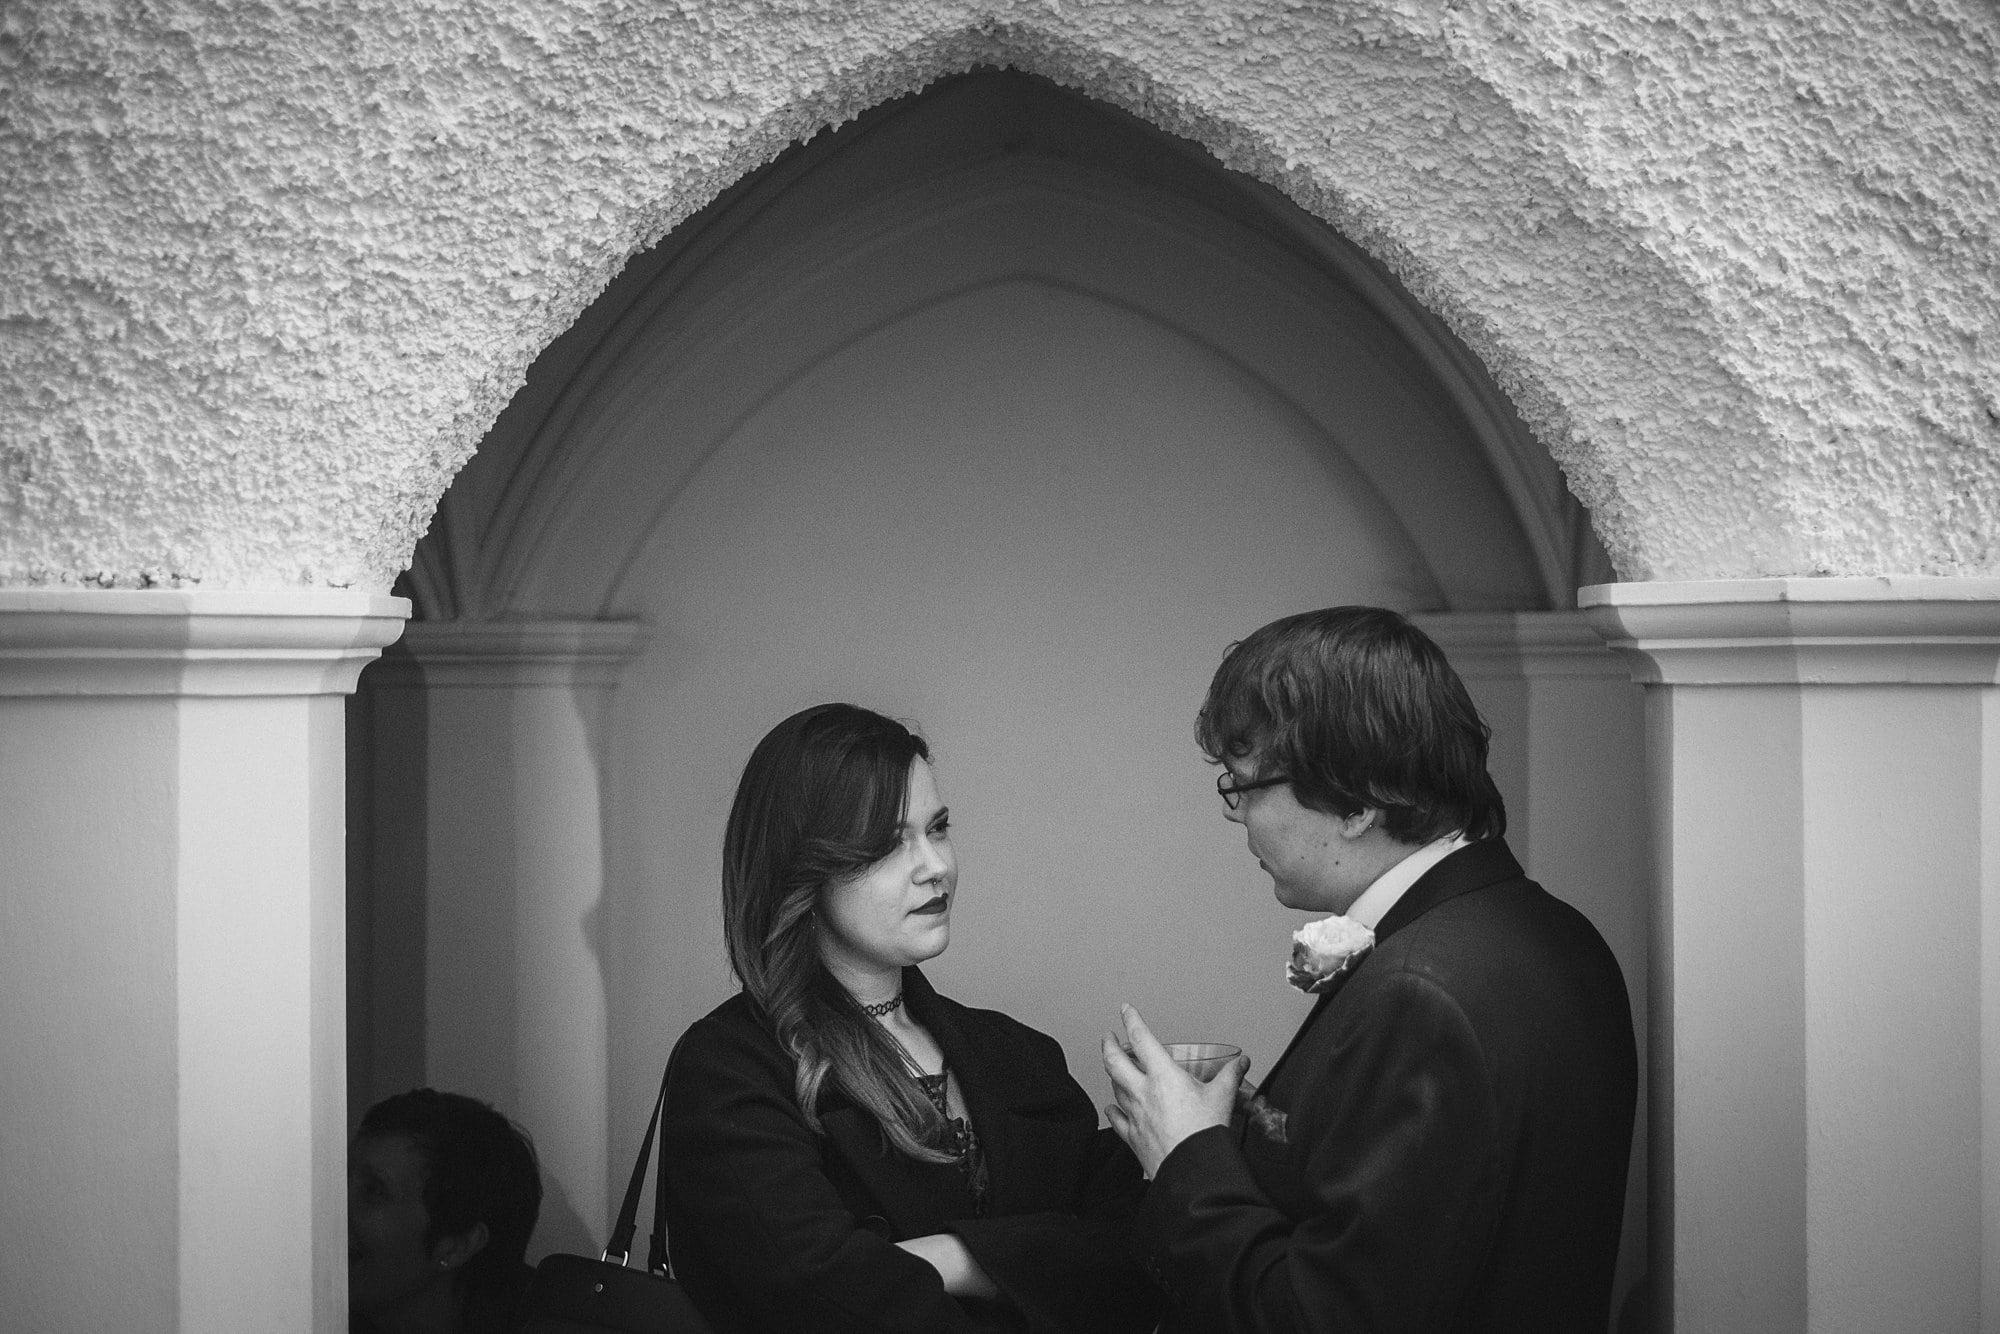 strawberry hill house wedding photographer cc 091 - Strawberry Hill House Wedding Photographer | Charlotte + Cristiano